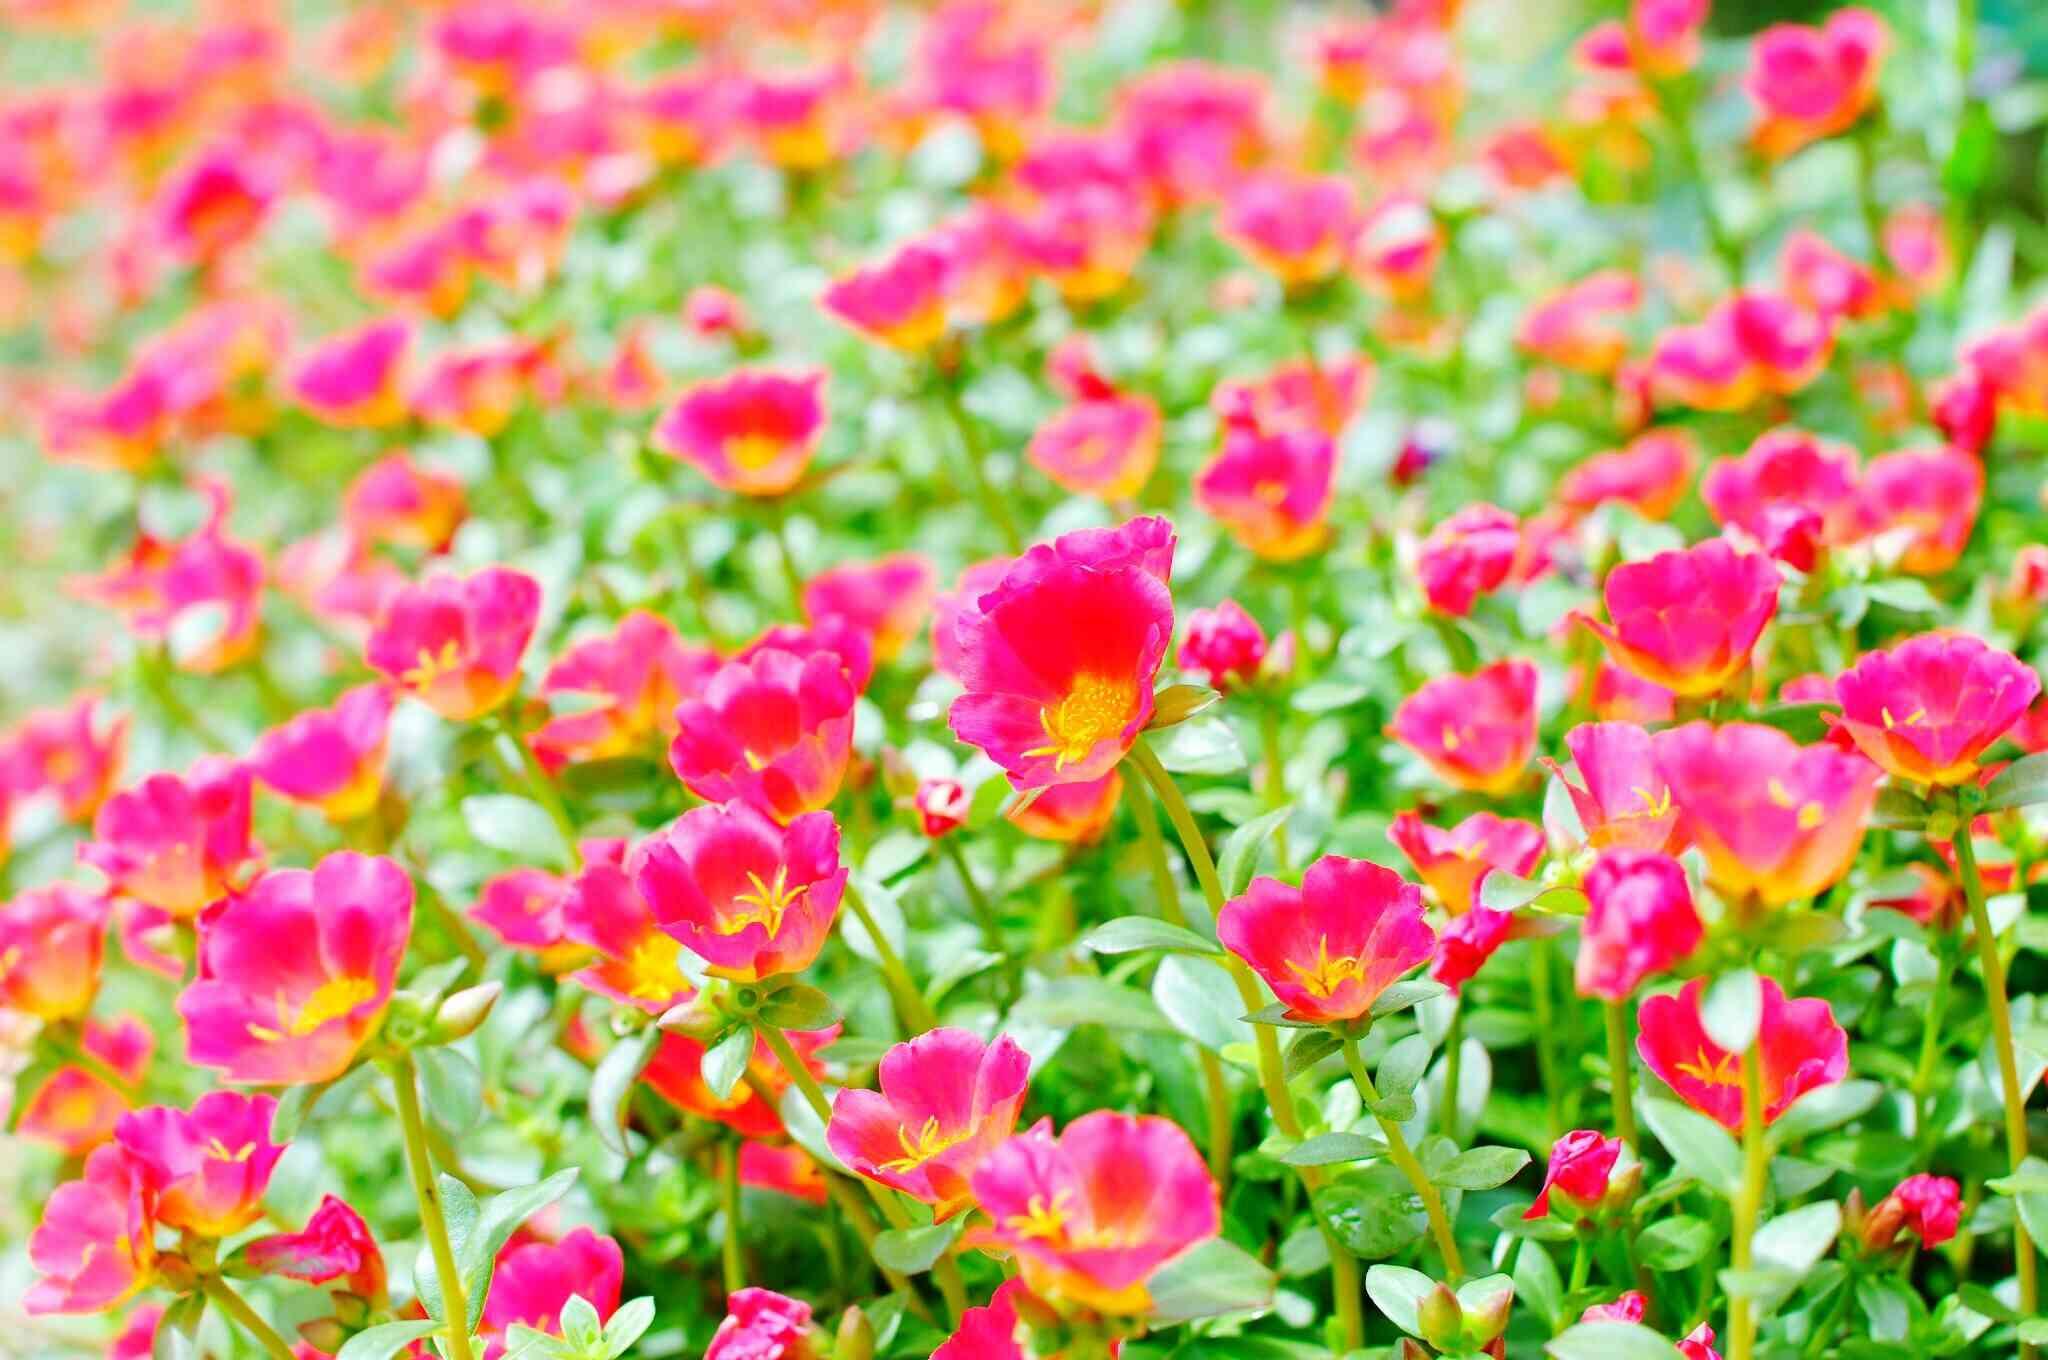 Mass of pink portulaca plants.